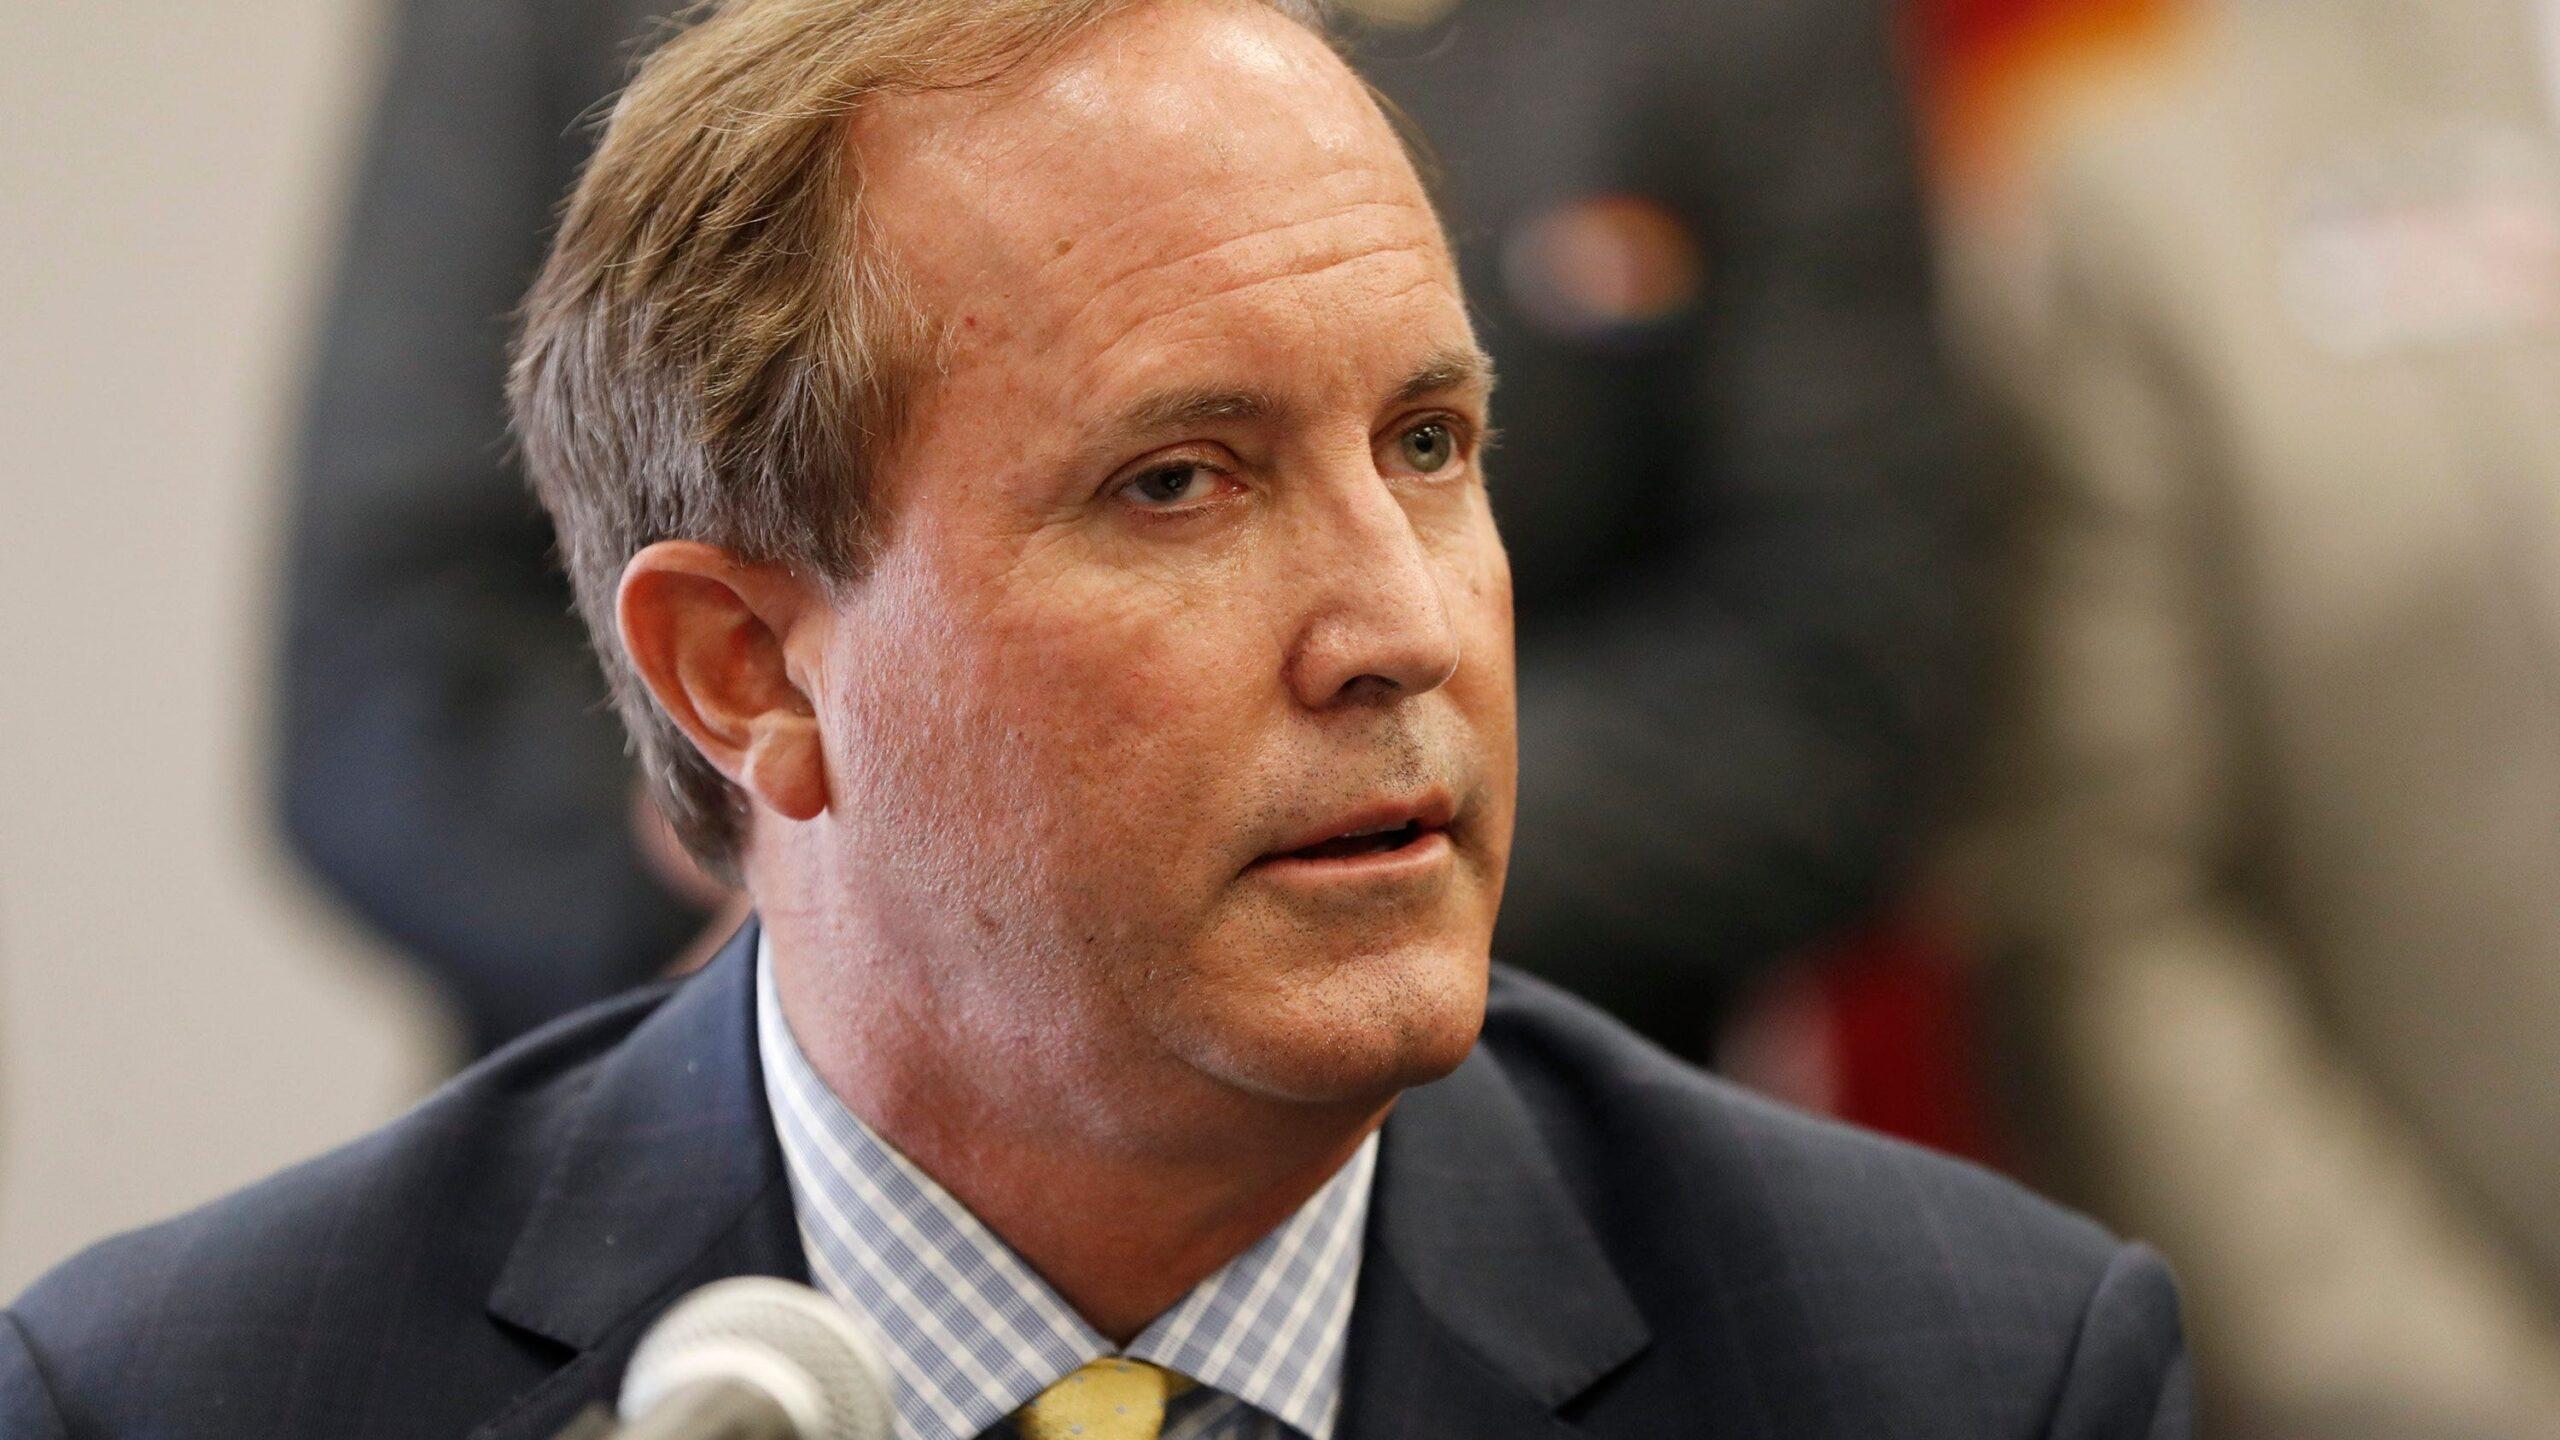 U.S. judge halts Biden deportation moratorium at behest of Ken Paxton